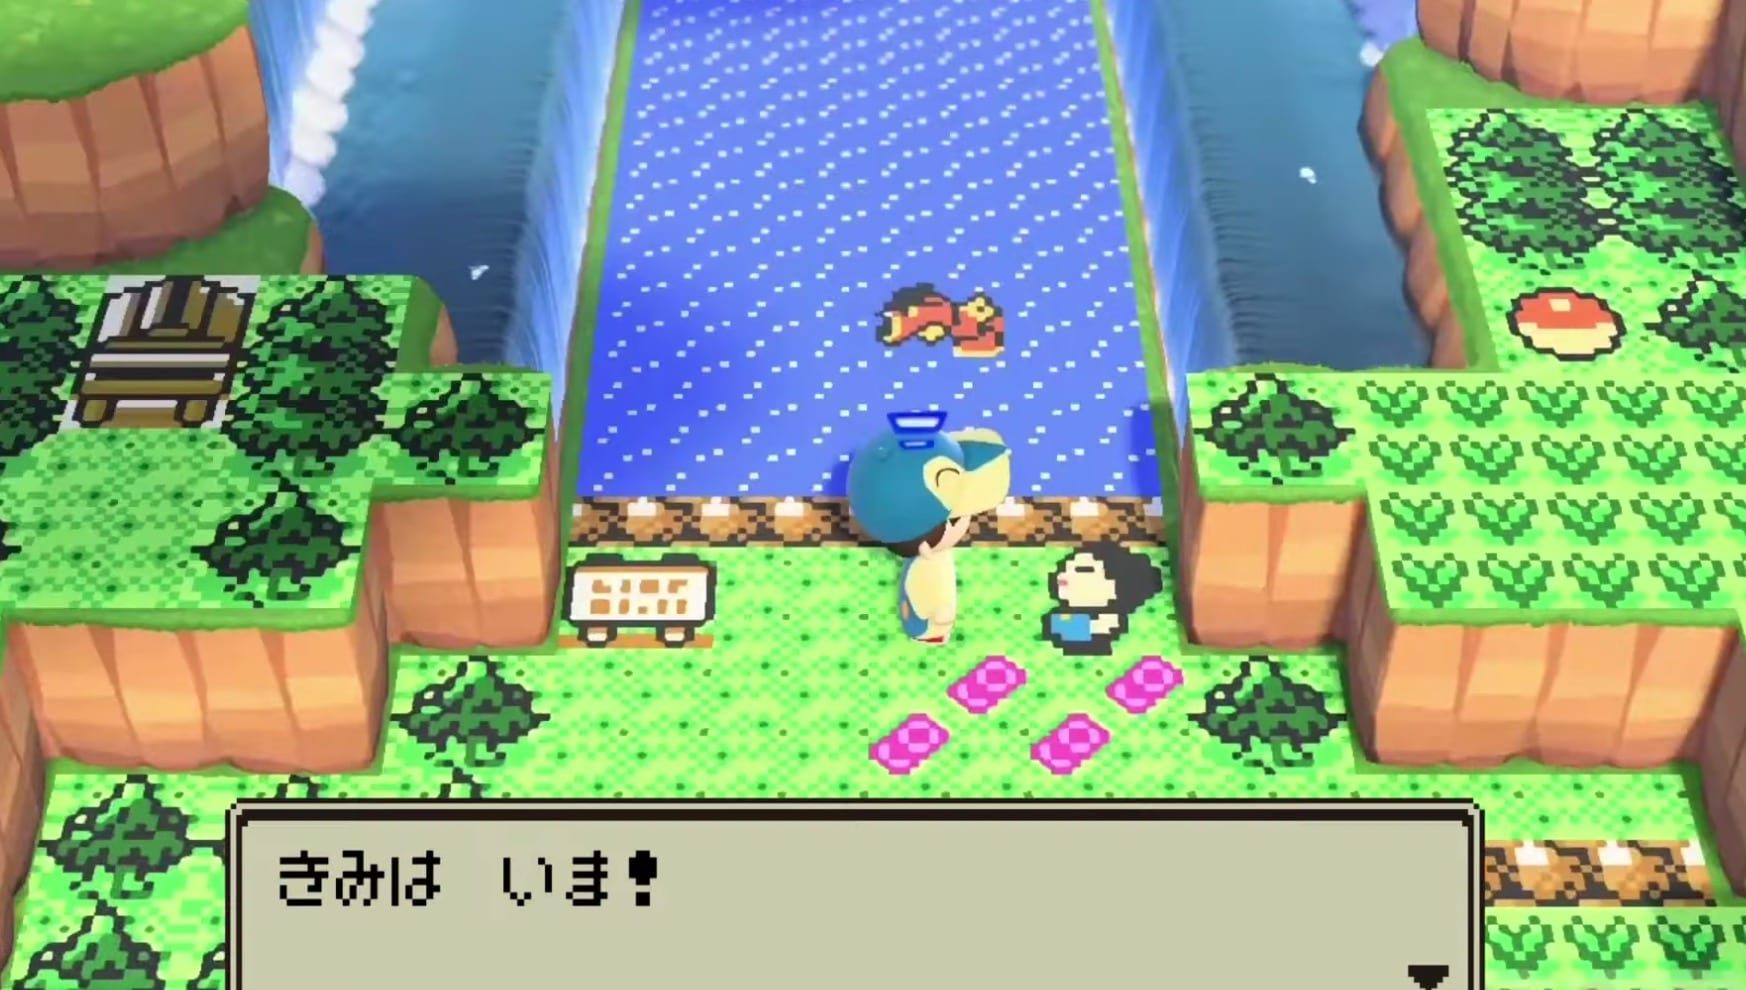 animal crossing new horizons pokemon johto region, gold and silver, crystal recreation